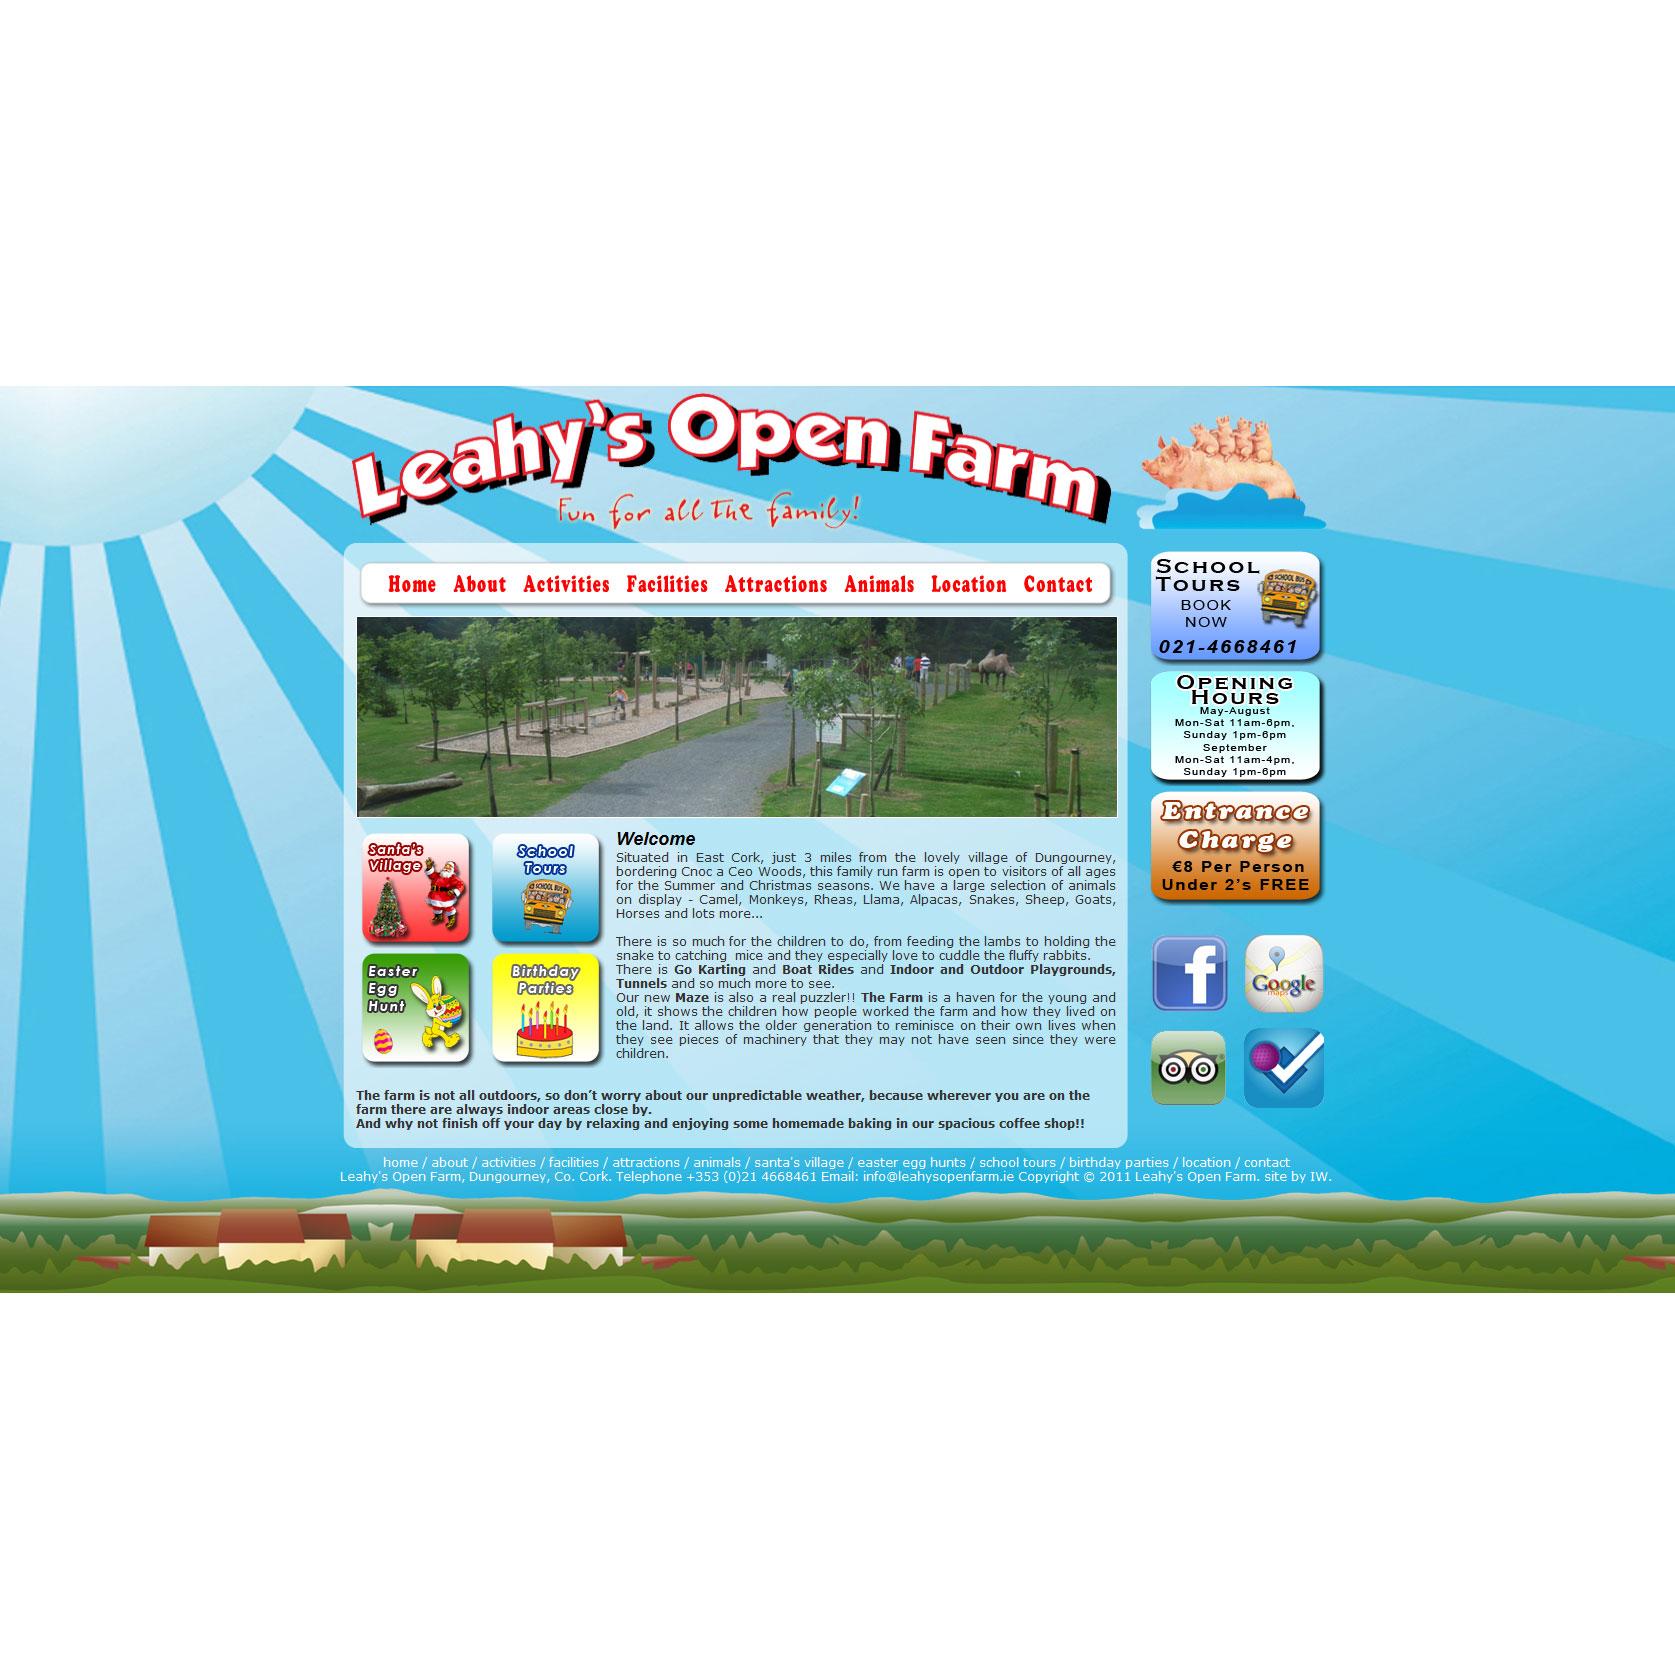 Leahys-Open-Farm